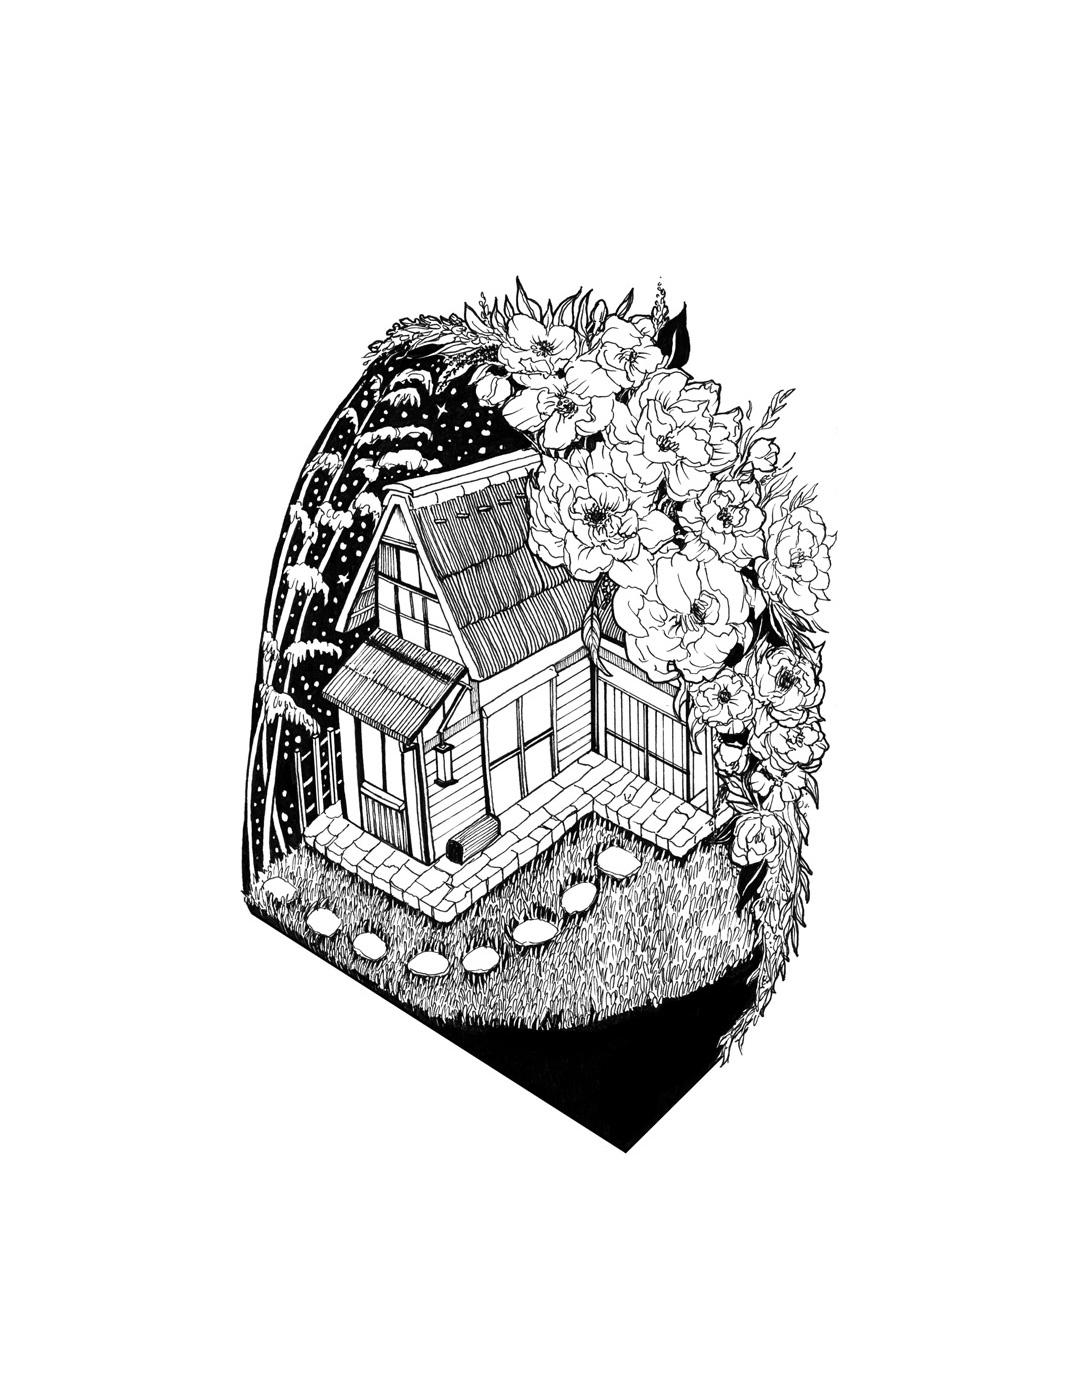 jap-farmhouse_02.jpg